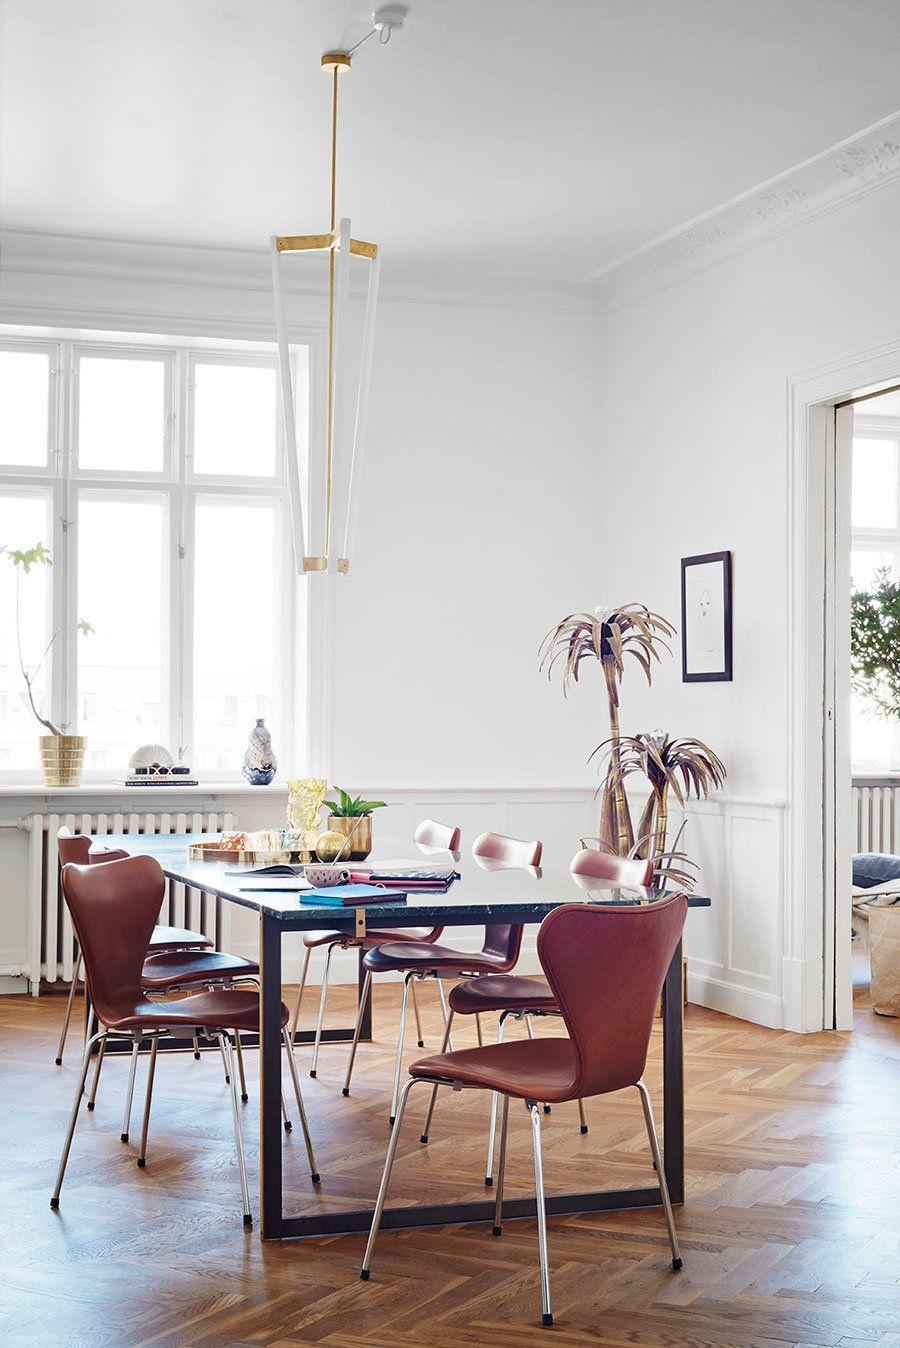 Pernille_Teisbeak_07_matplats_dining_room